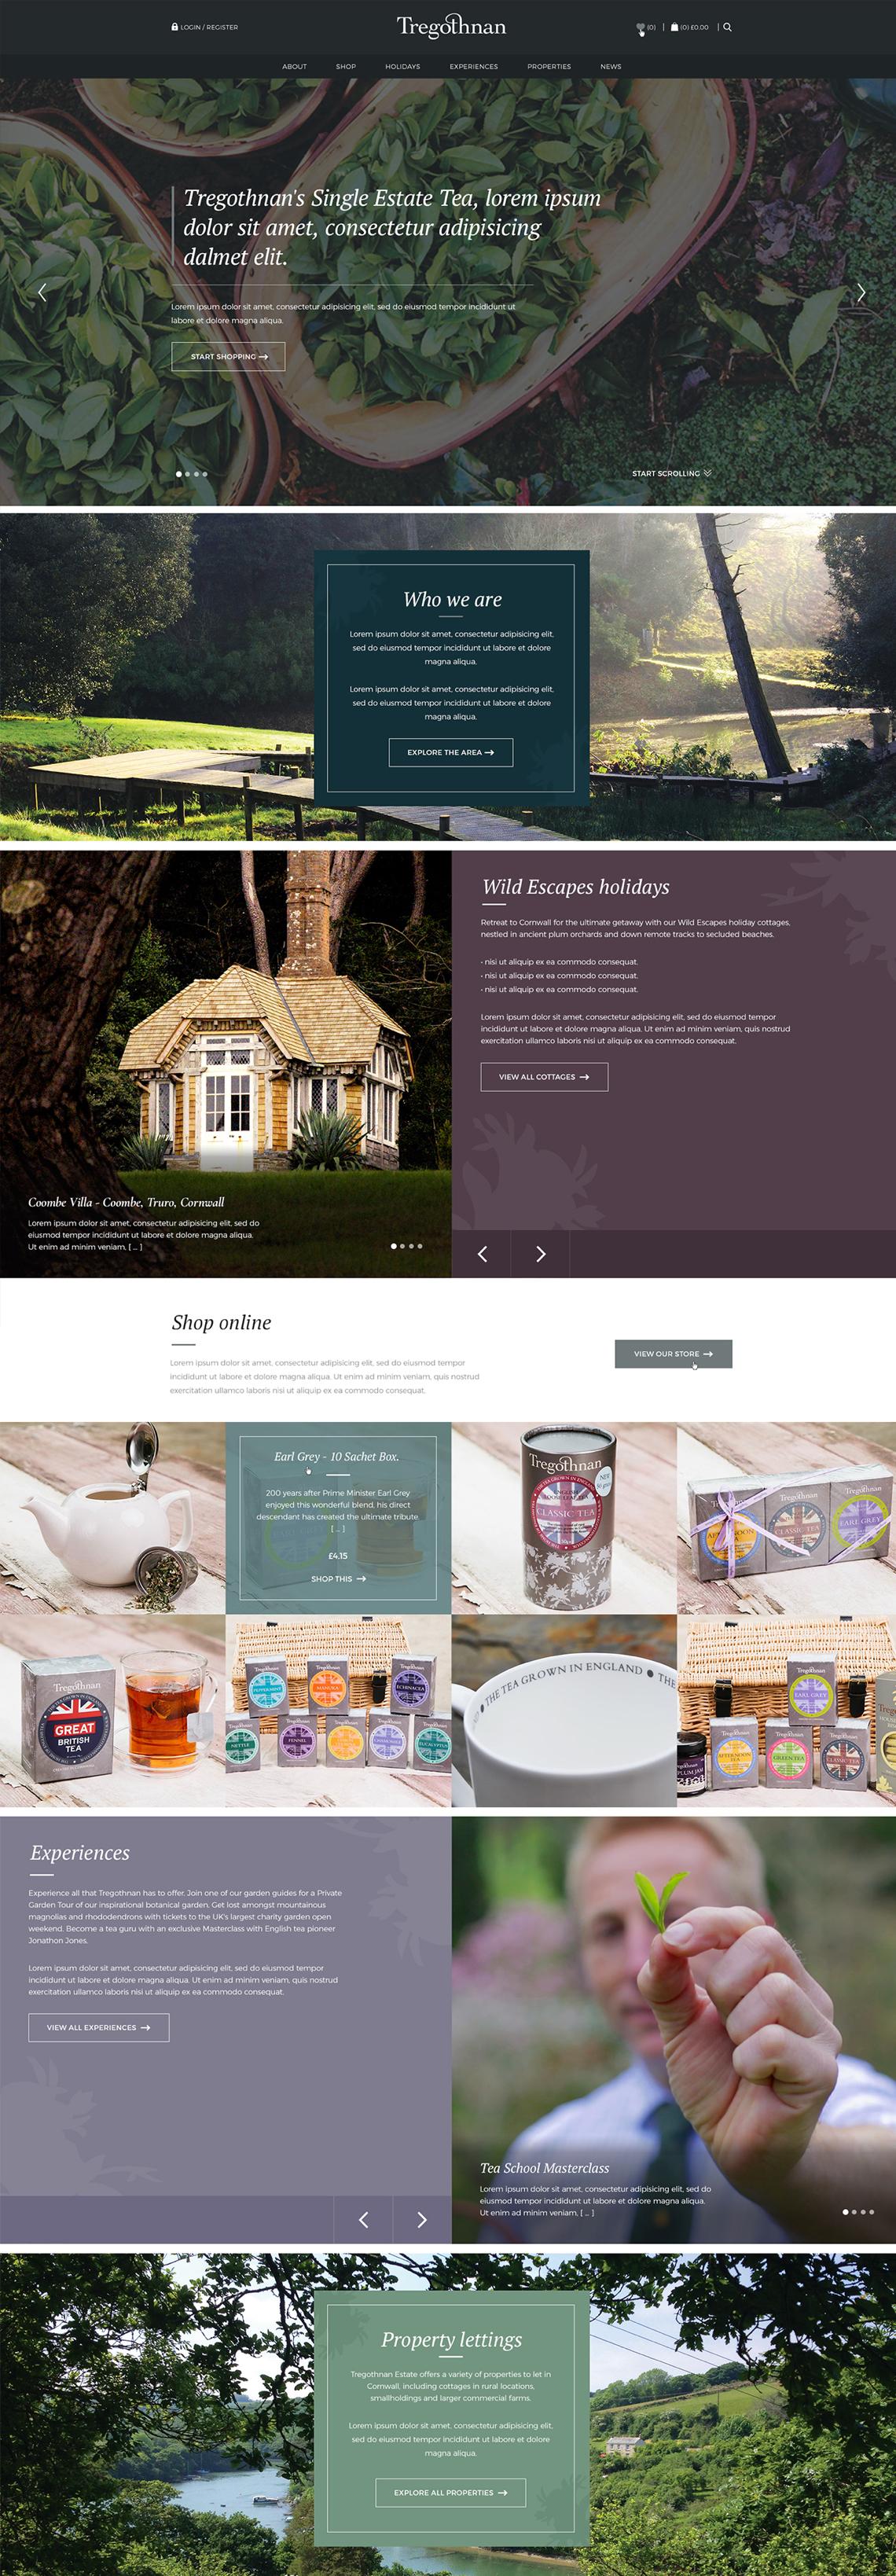 tregothnan full homepage showcase